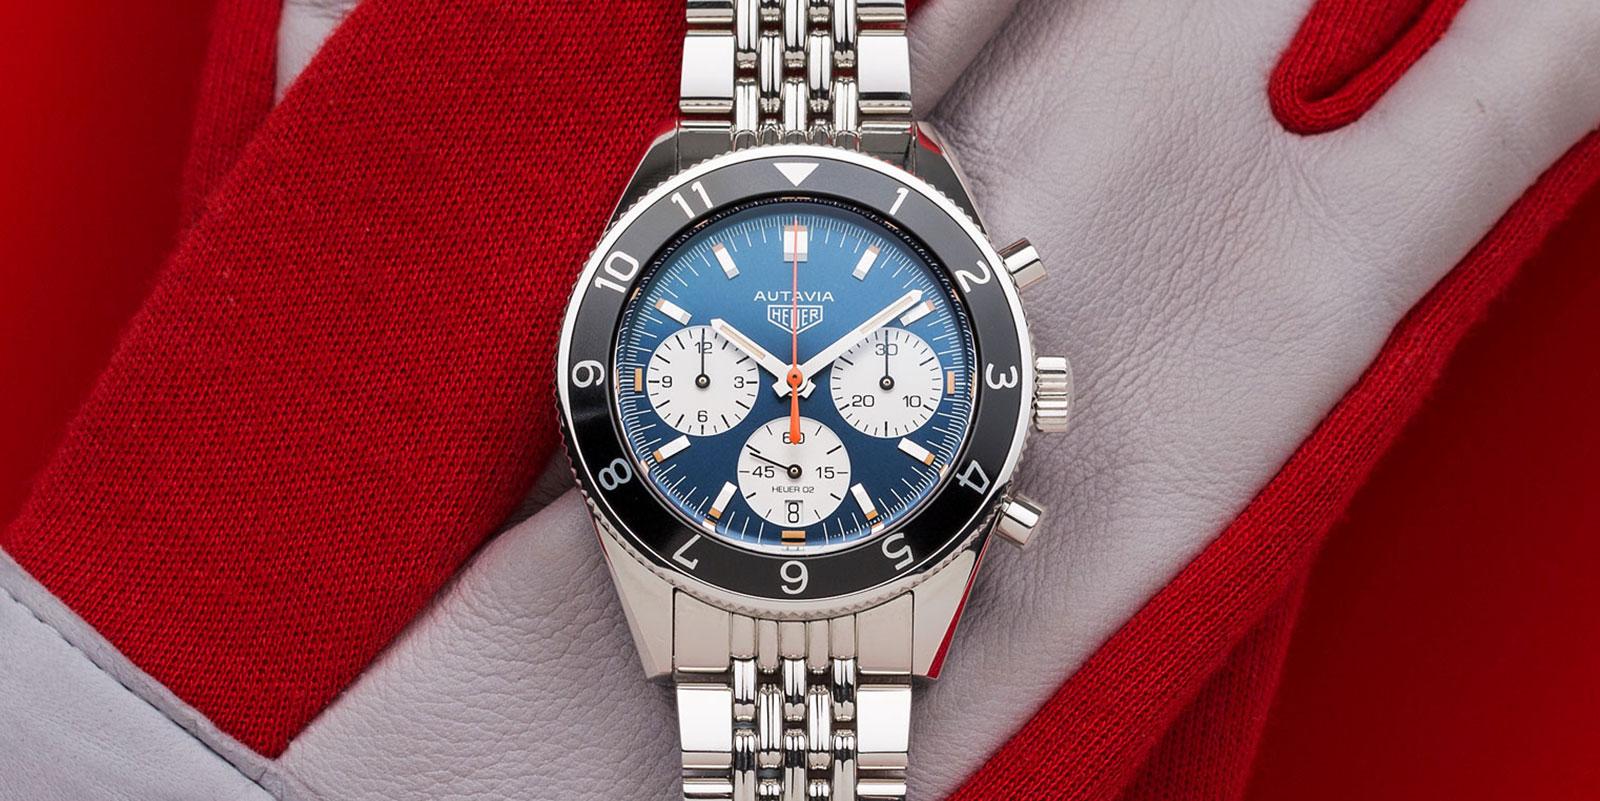 TAG Heuer Autavia Watches of Switzerland Australia 1